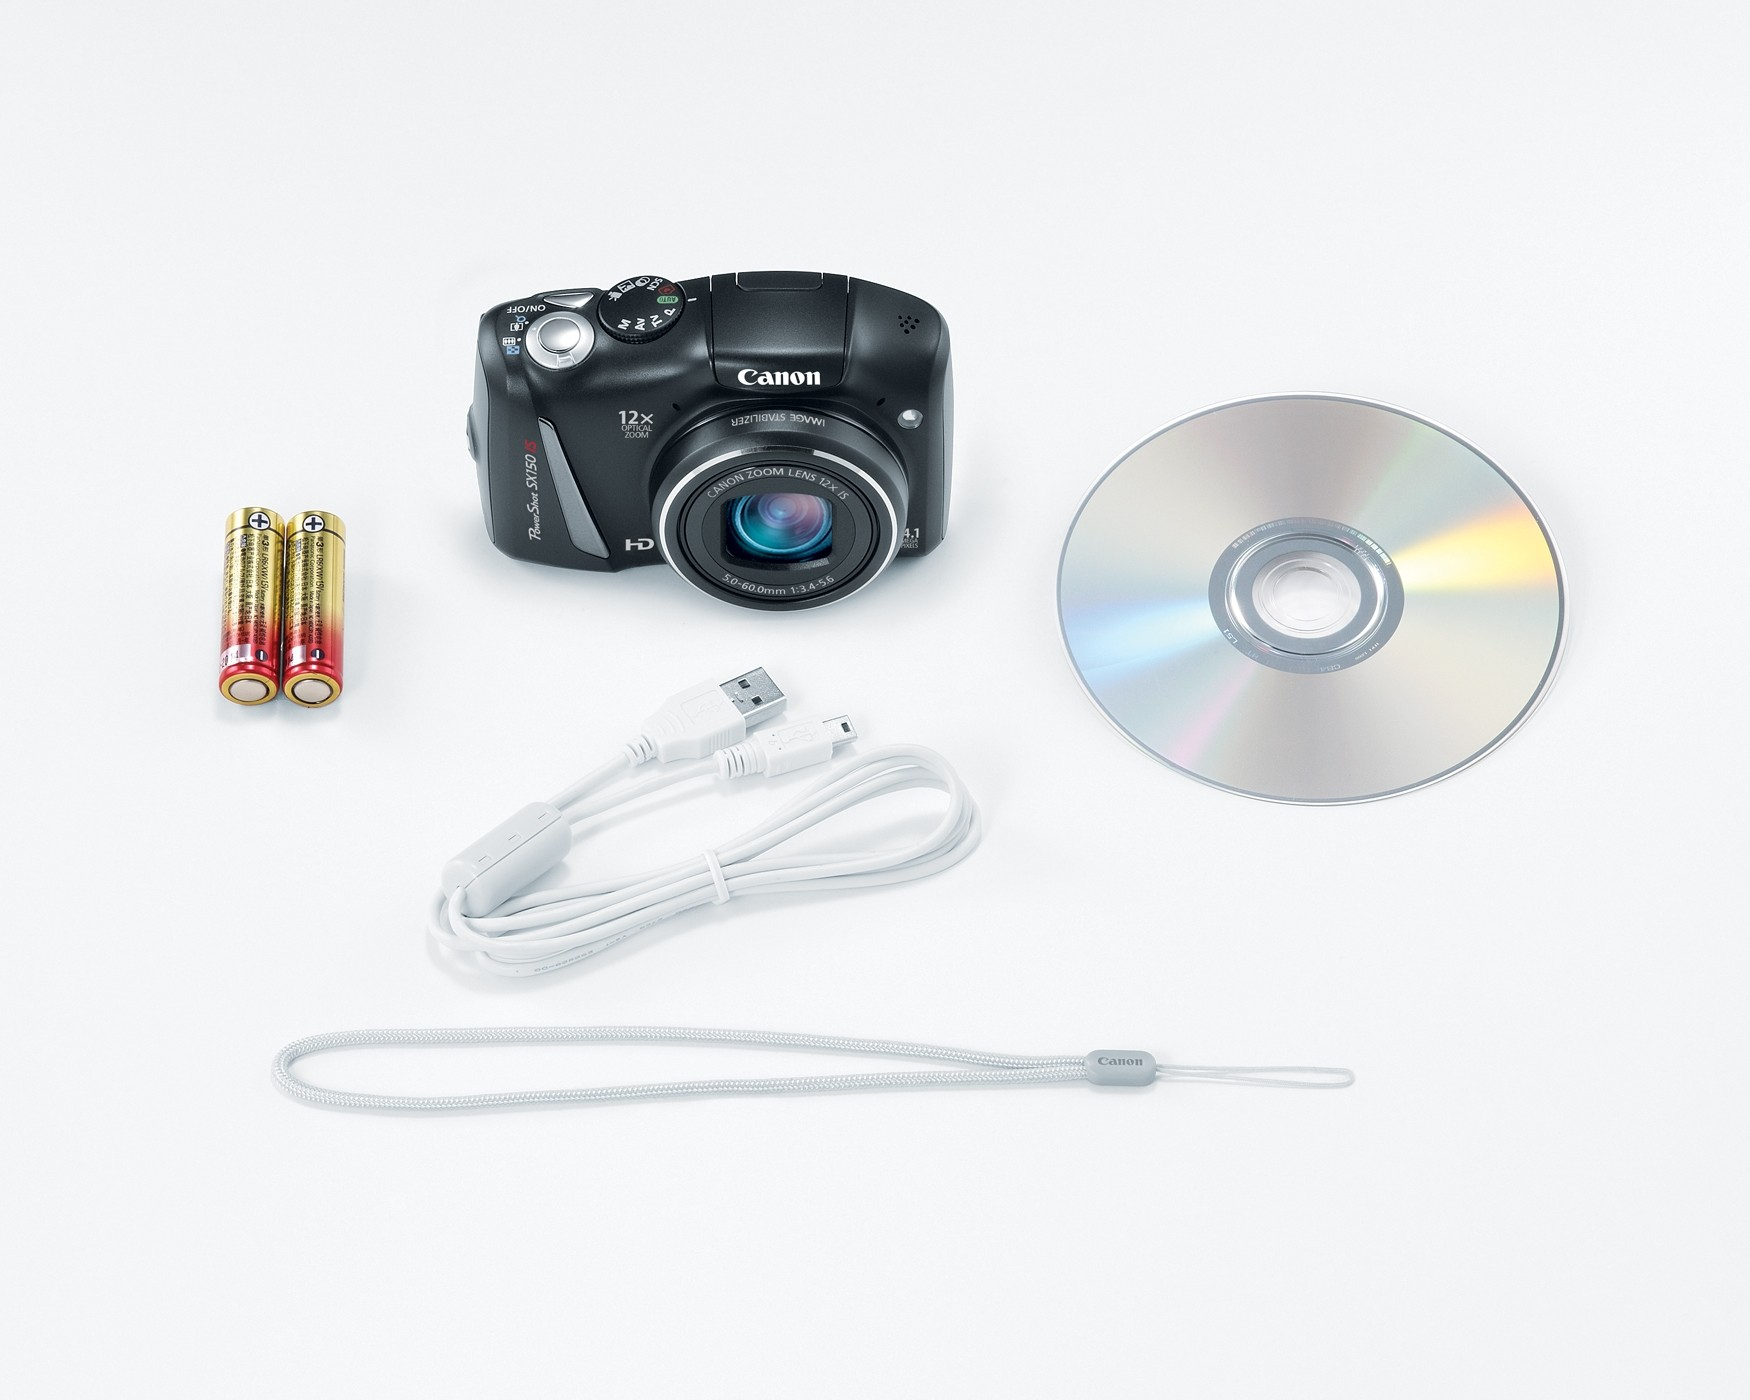 Canon PowerShot S40 Driver Download